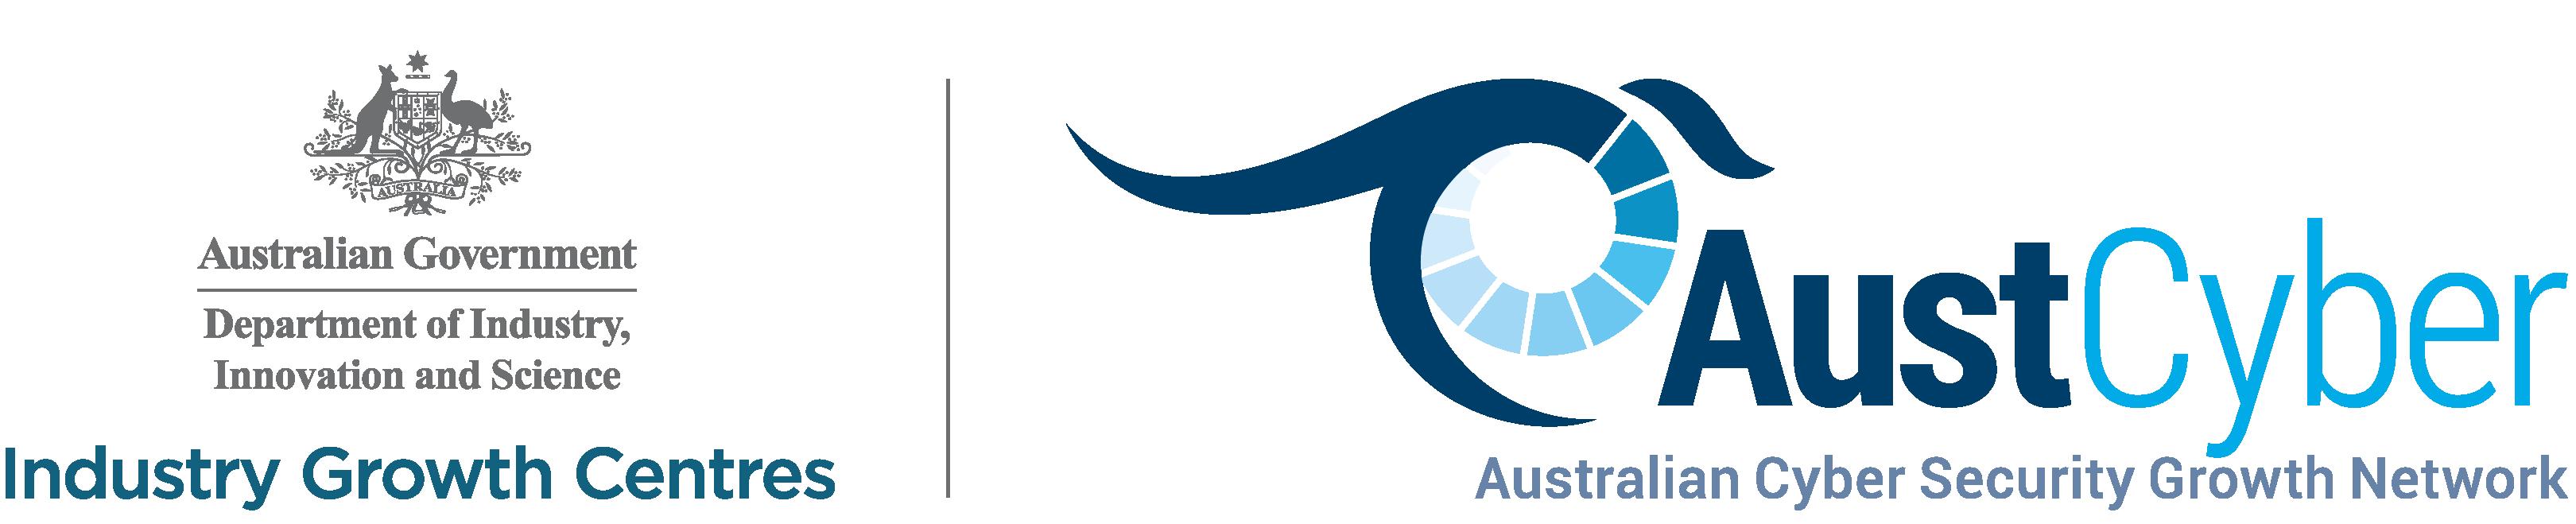 AustCyber